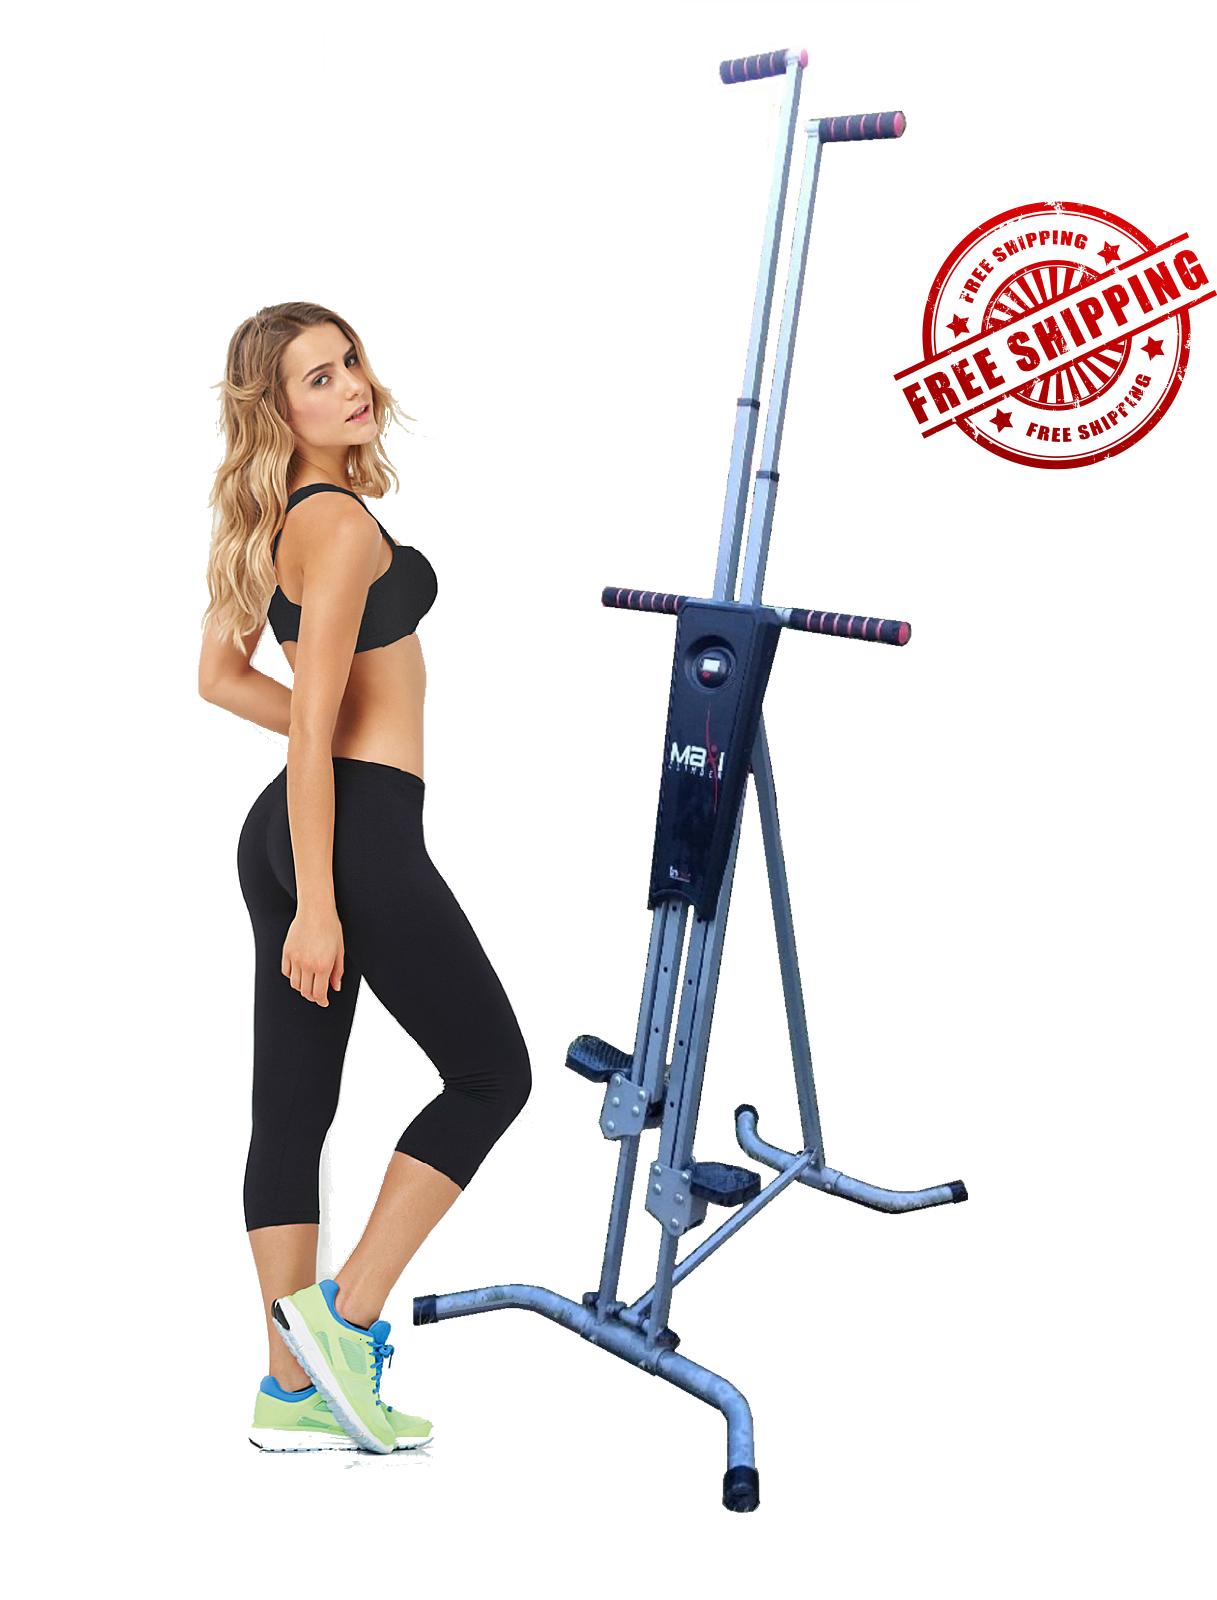 Maxi Climber Vertical Climber w Monitor, Diet Menu, Exercise Manual 2